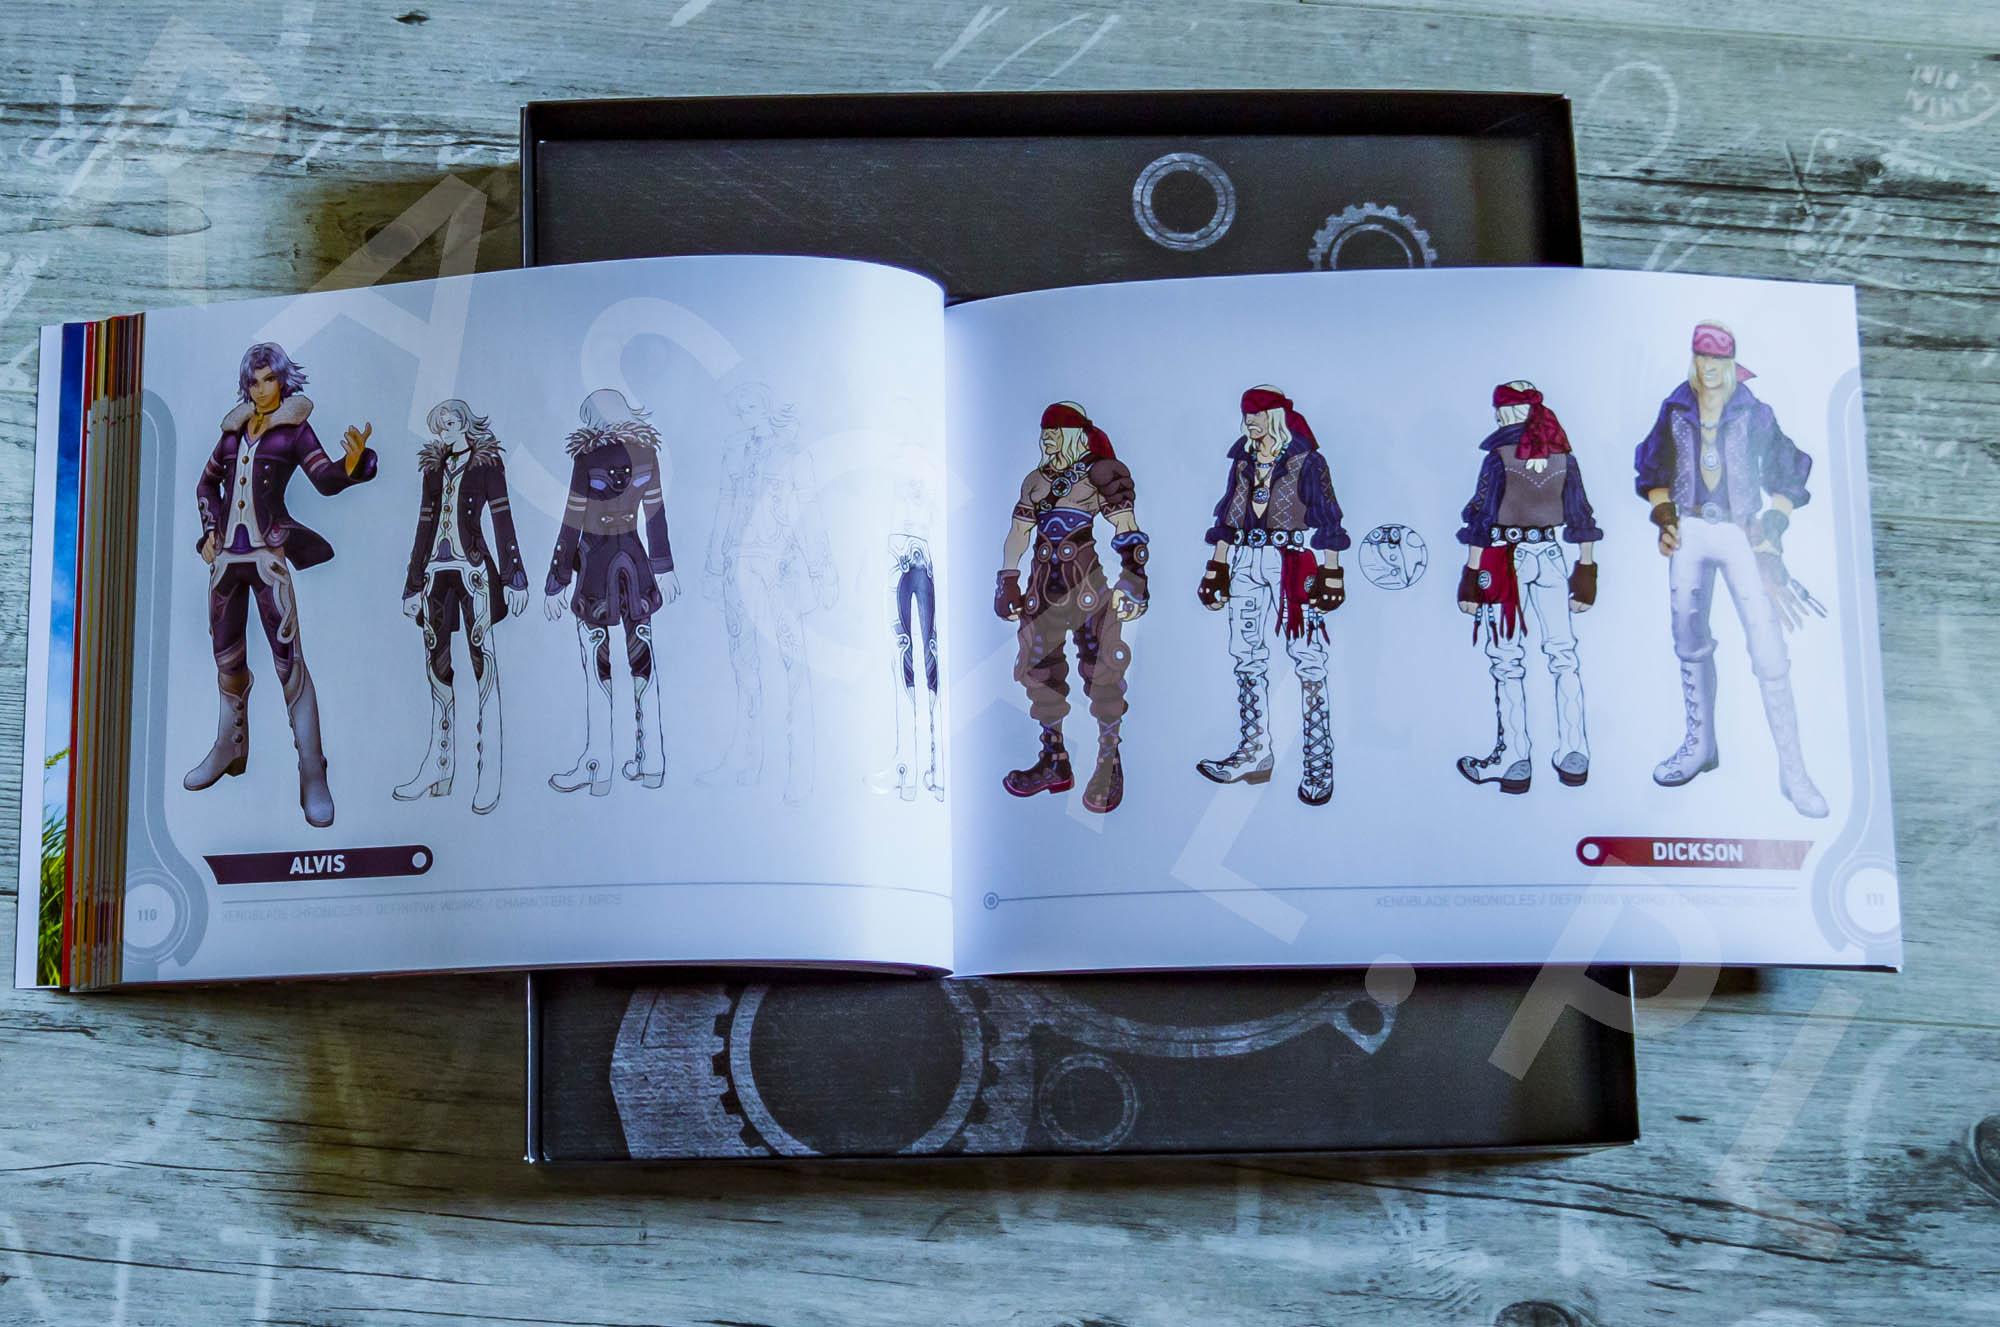 Xenoblade Chronicles Definitive Edition Collectors Set - Artbook - 11 - Alvis / Dickson